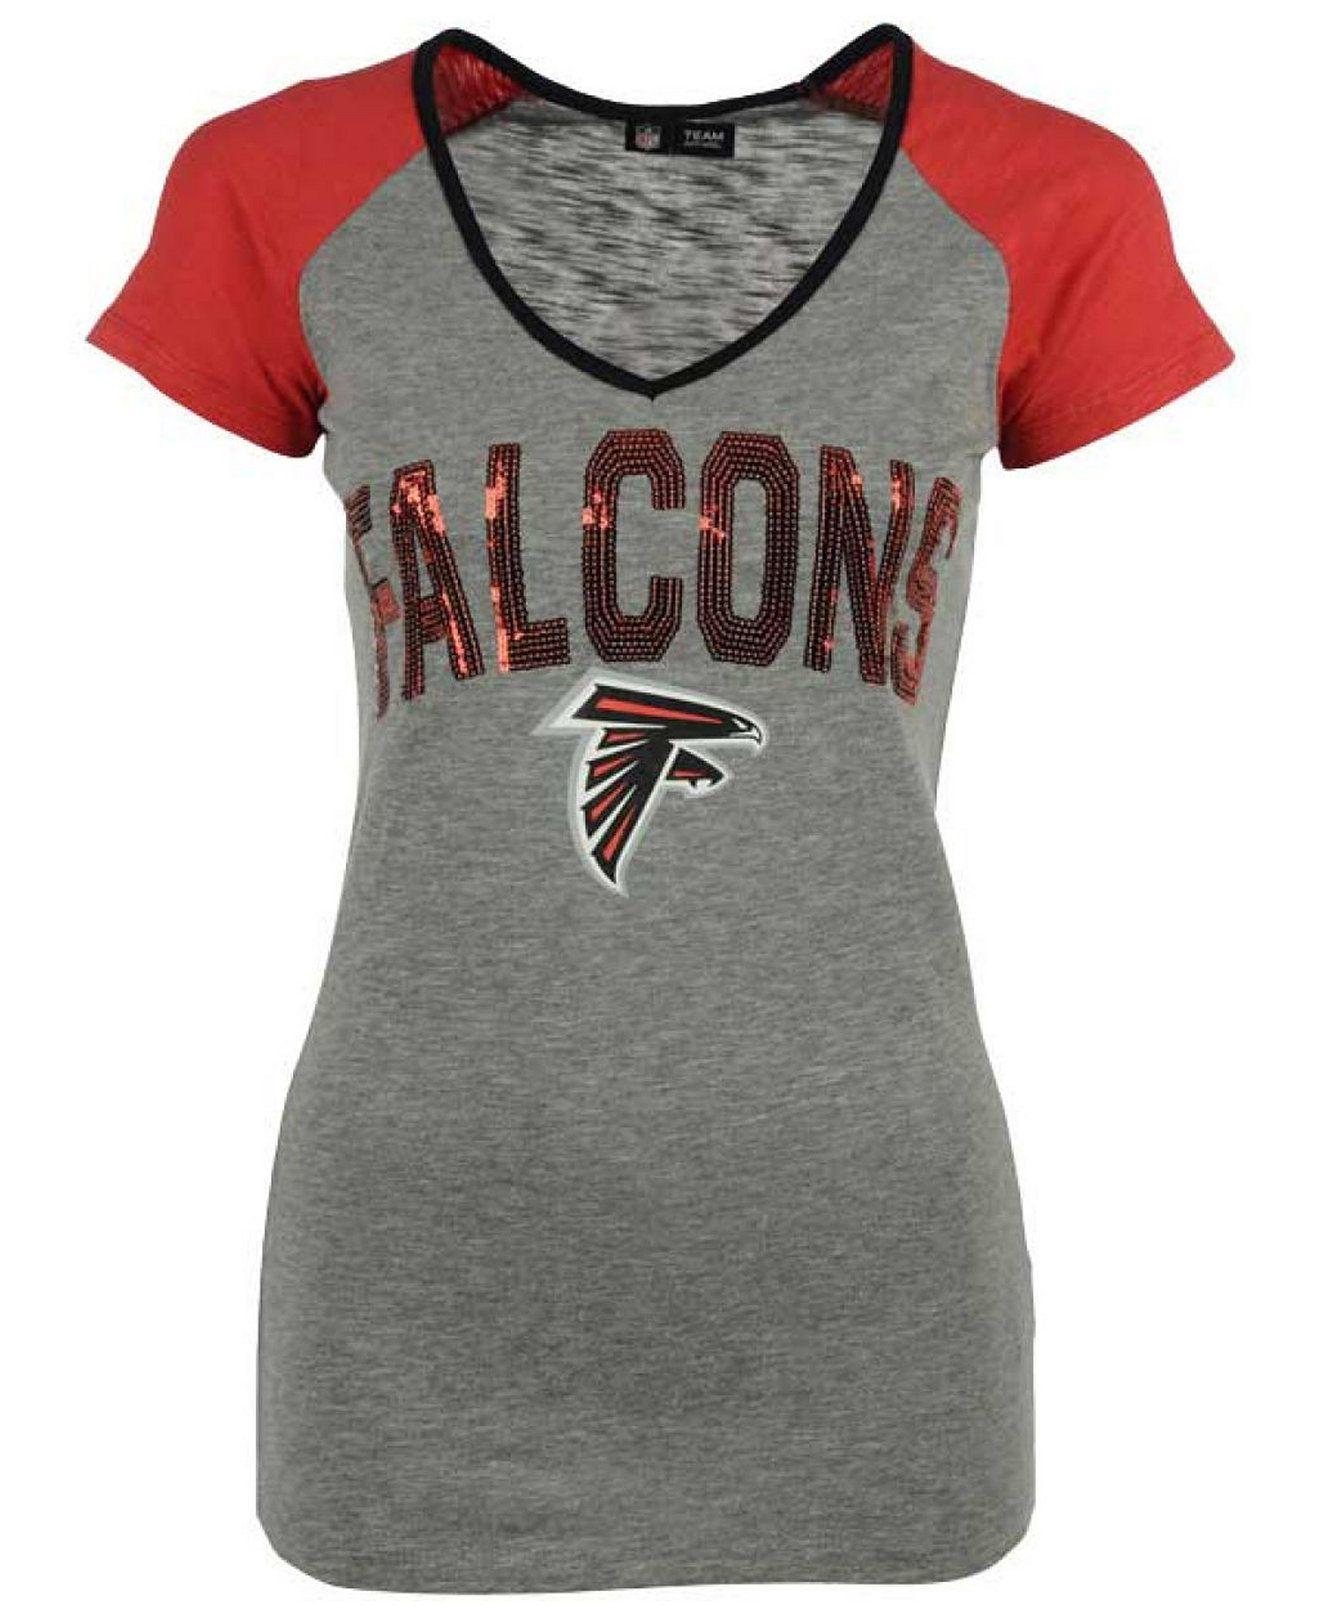 5th & Ocean Women's Atlanta Falcons Sequin T Shirt Sports Fan Shop  hot sale